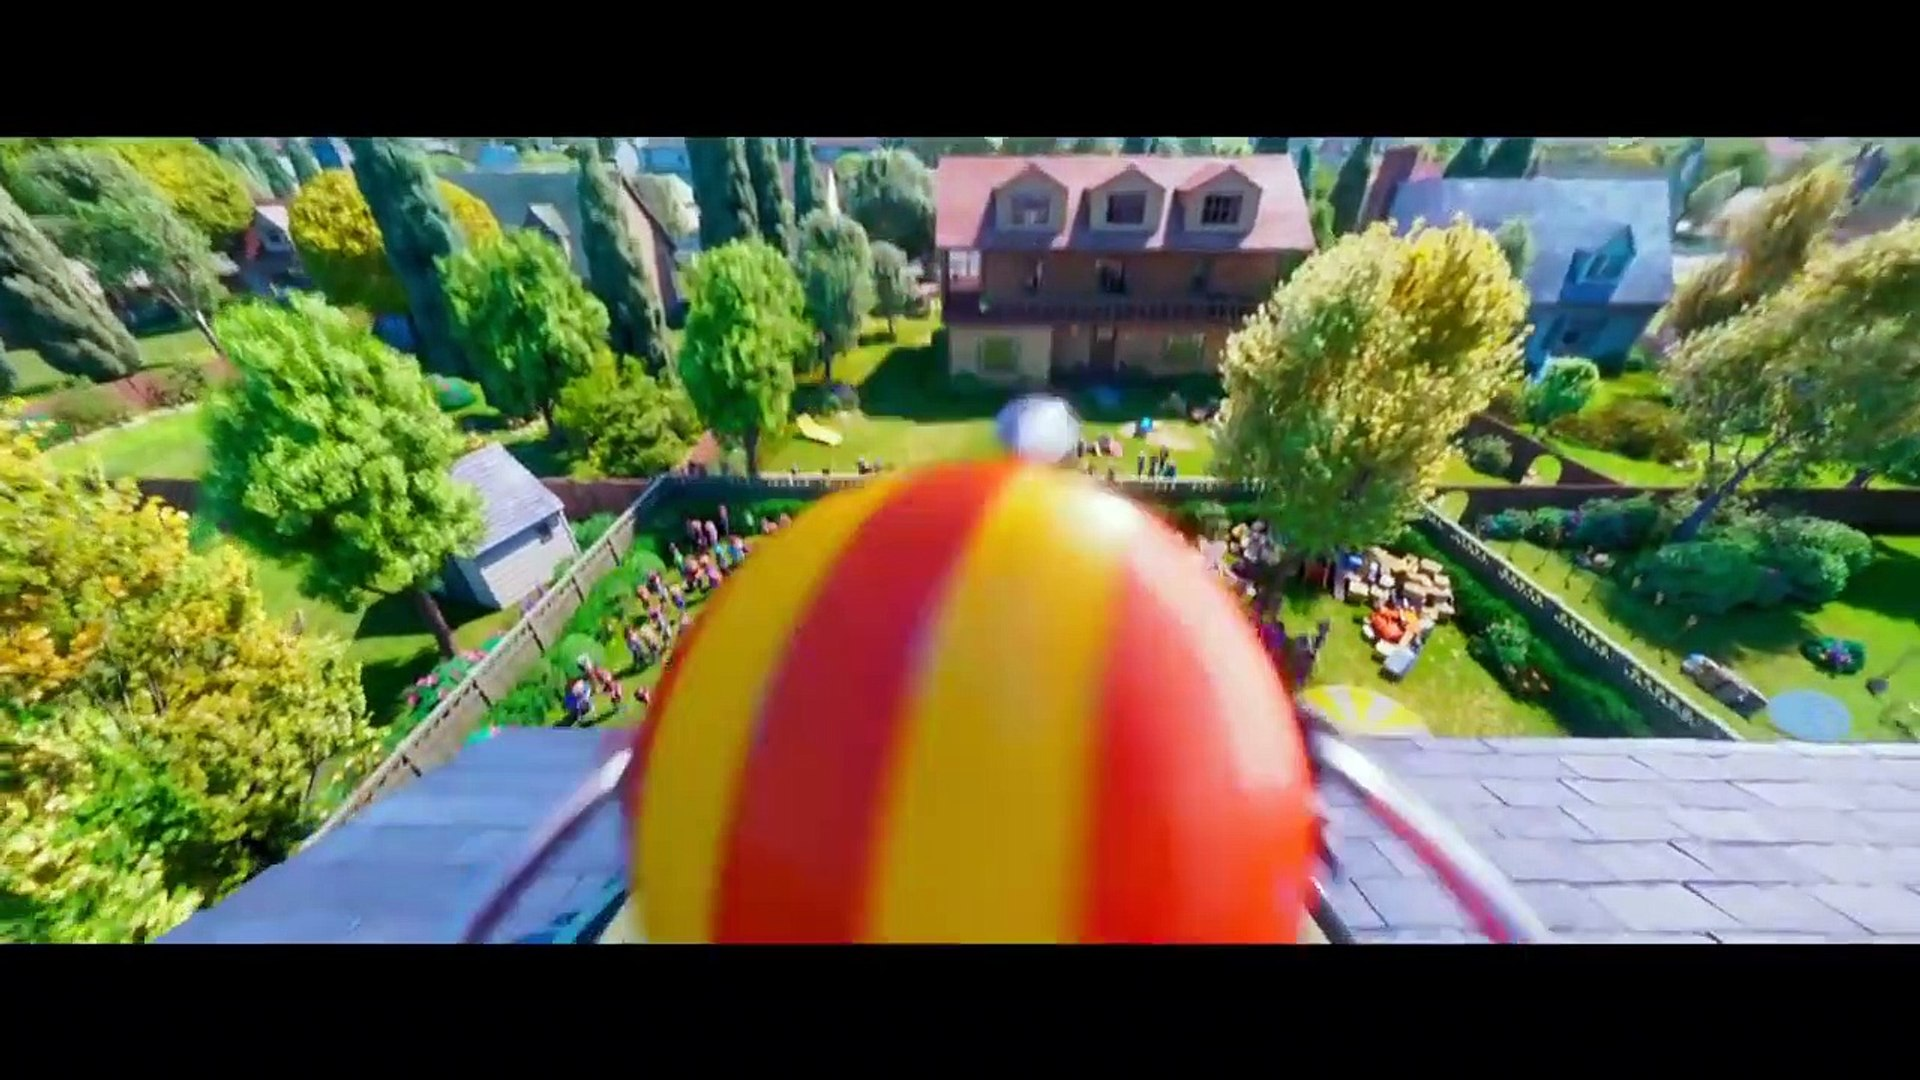 Wonder Park Super Bowl Trailer (2019) - Movieclips Trailers